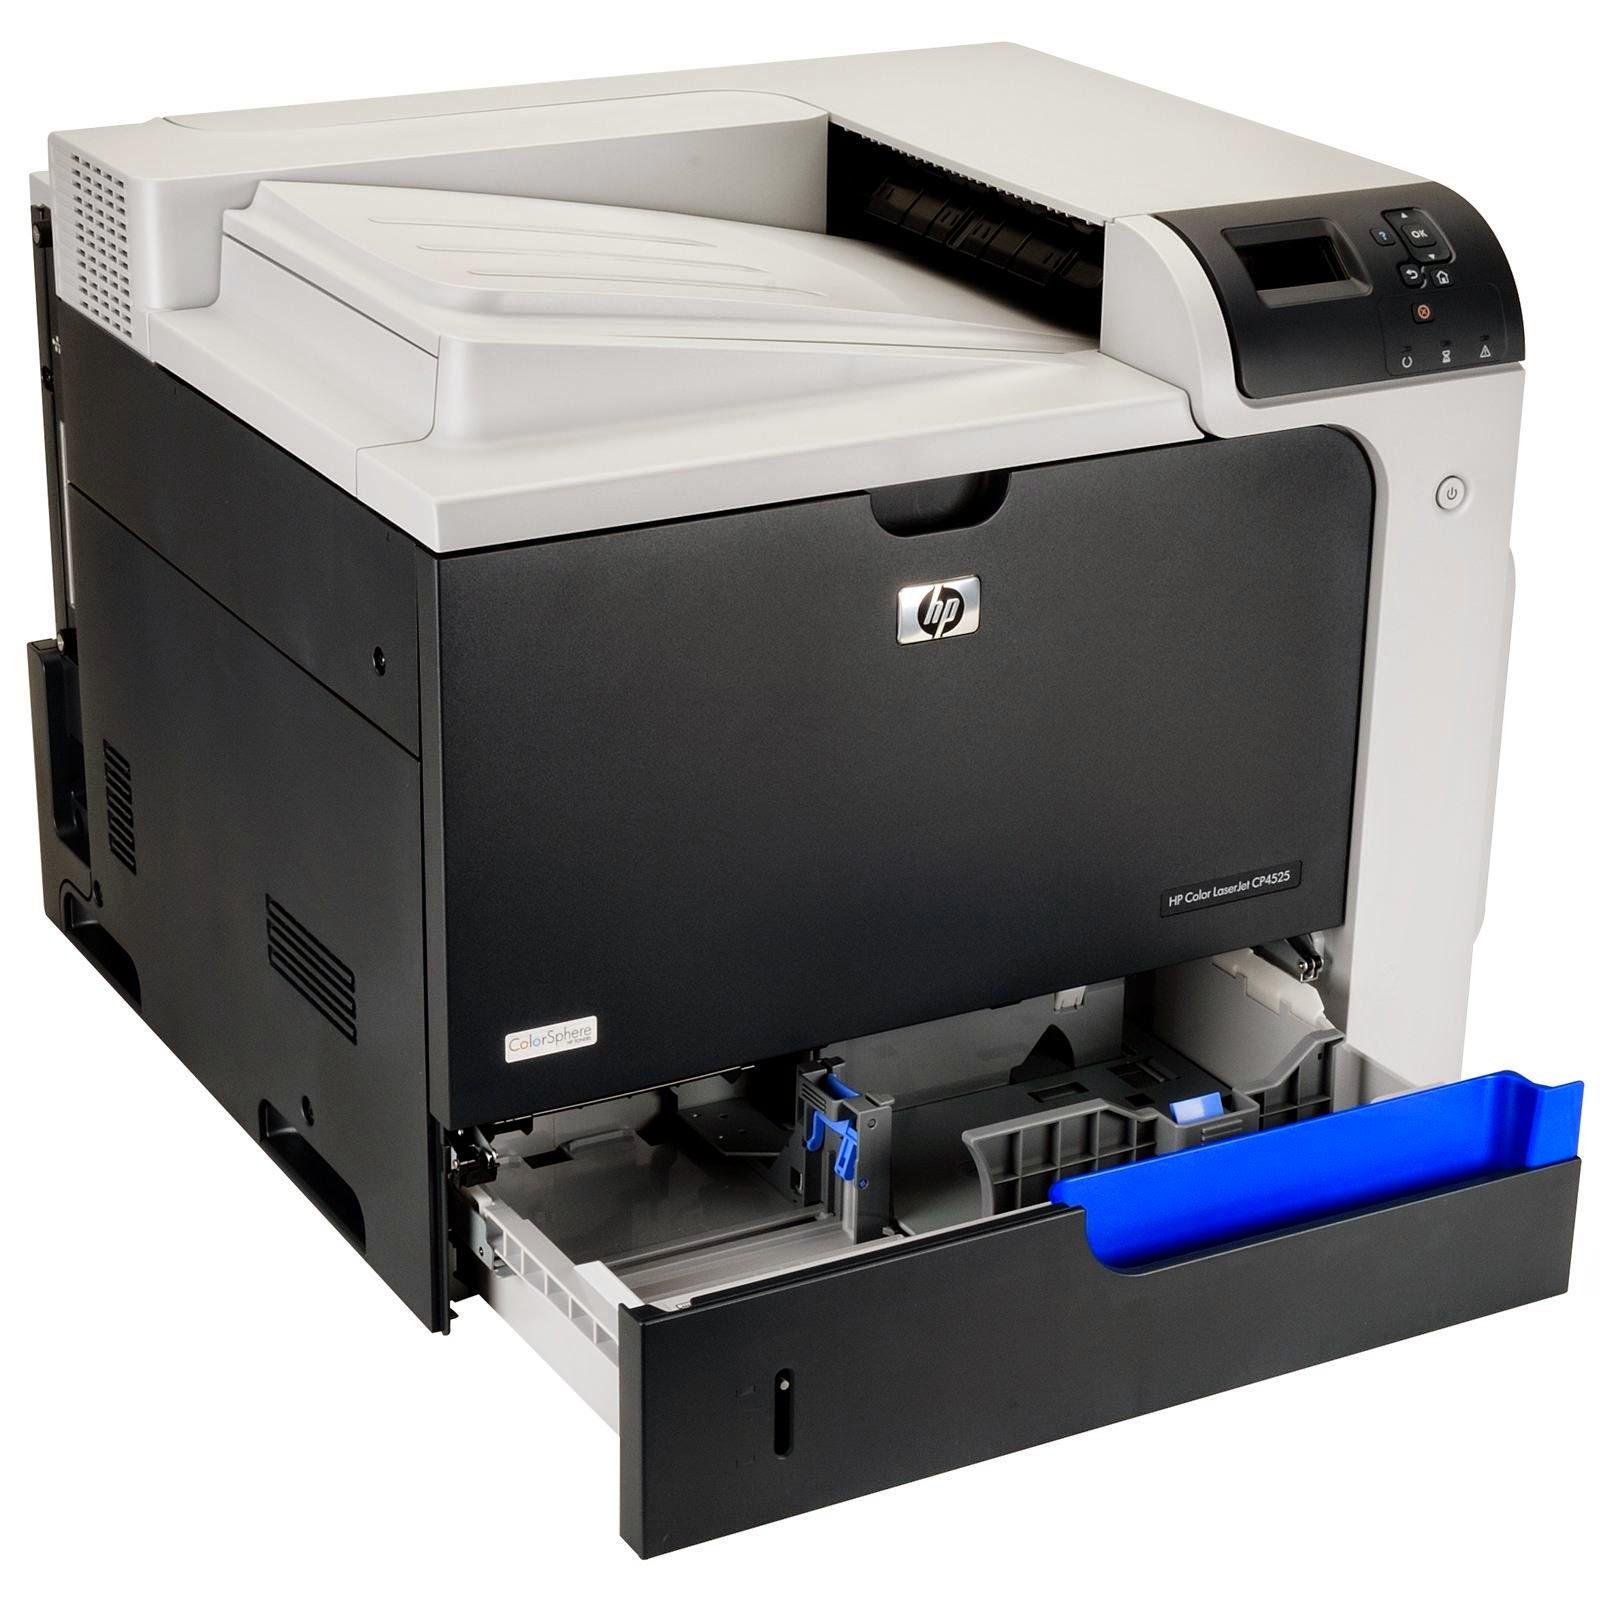 bullzip pdf printer download cnet